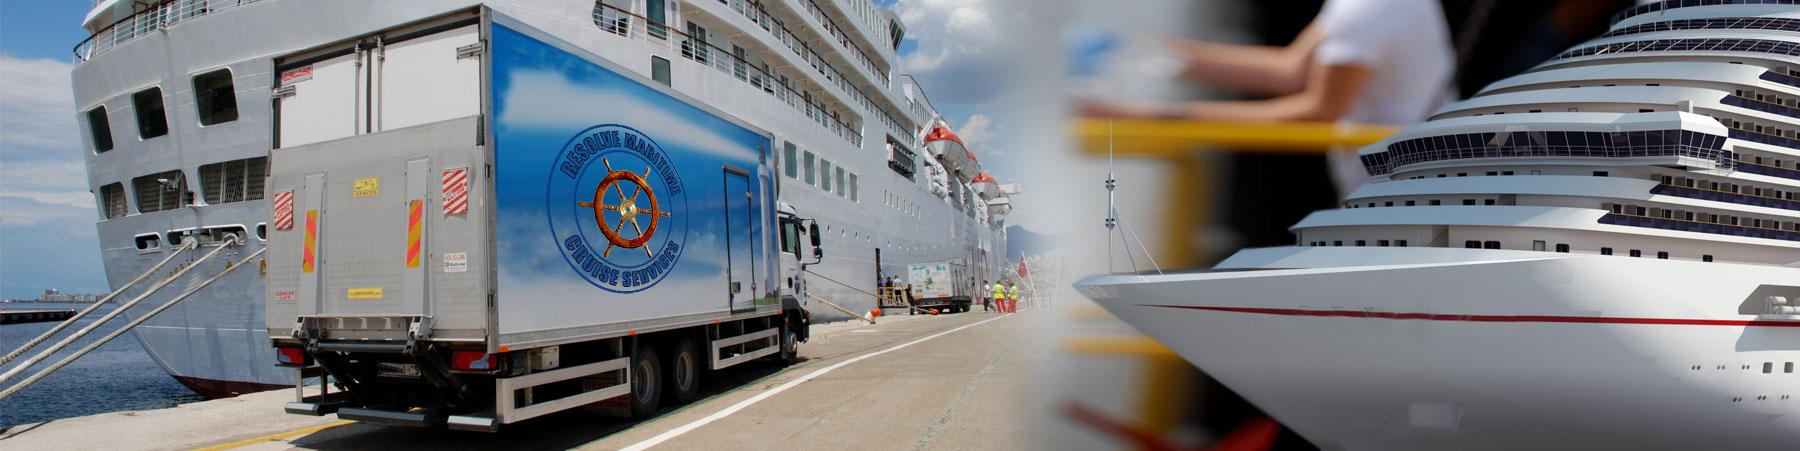 Resolve Maritime